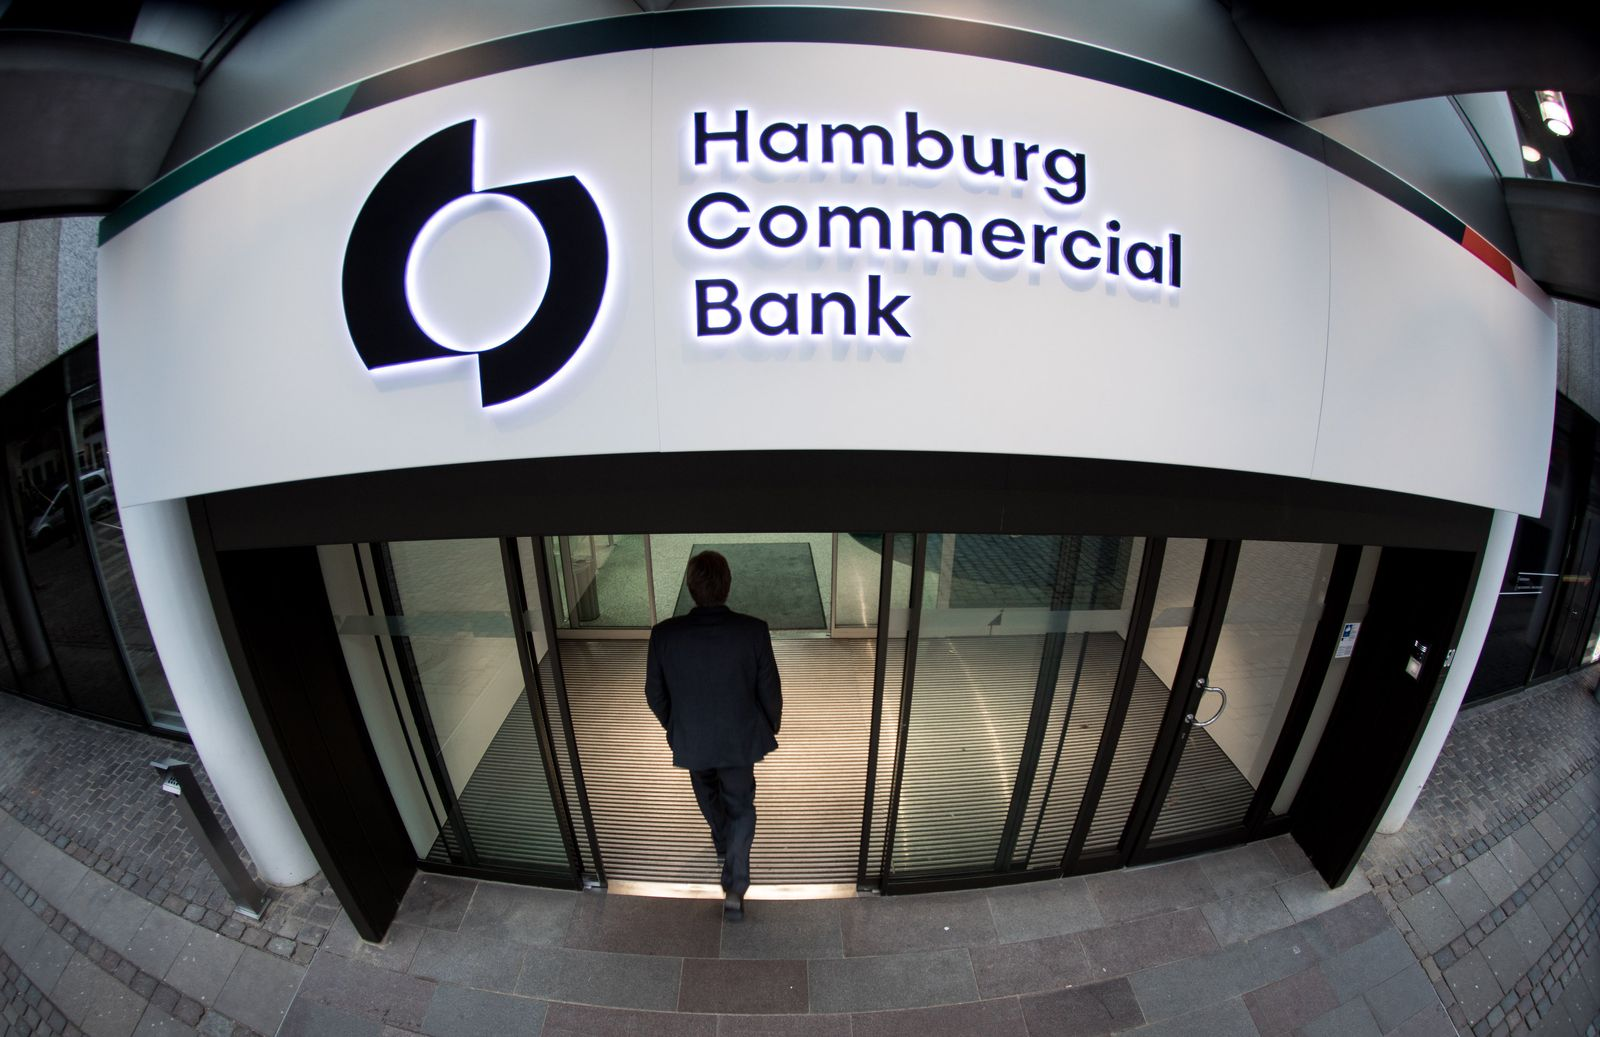 HSH Nordbank heißt jetzt Hamburg Commercial Bank